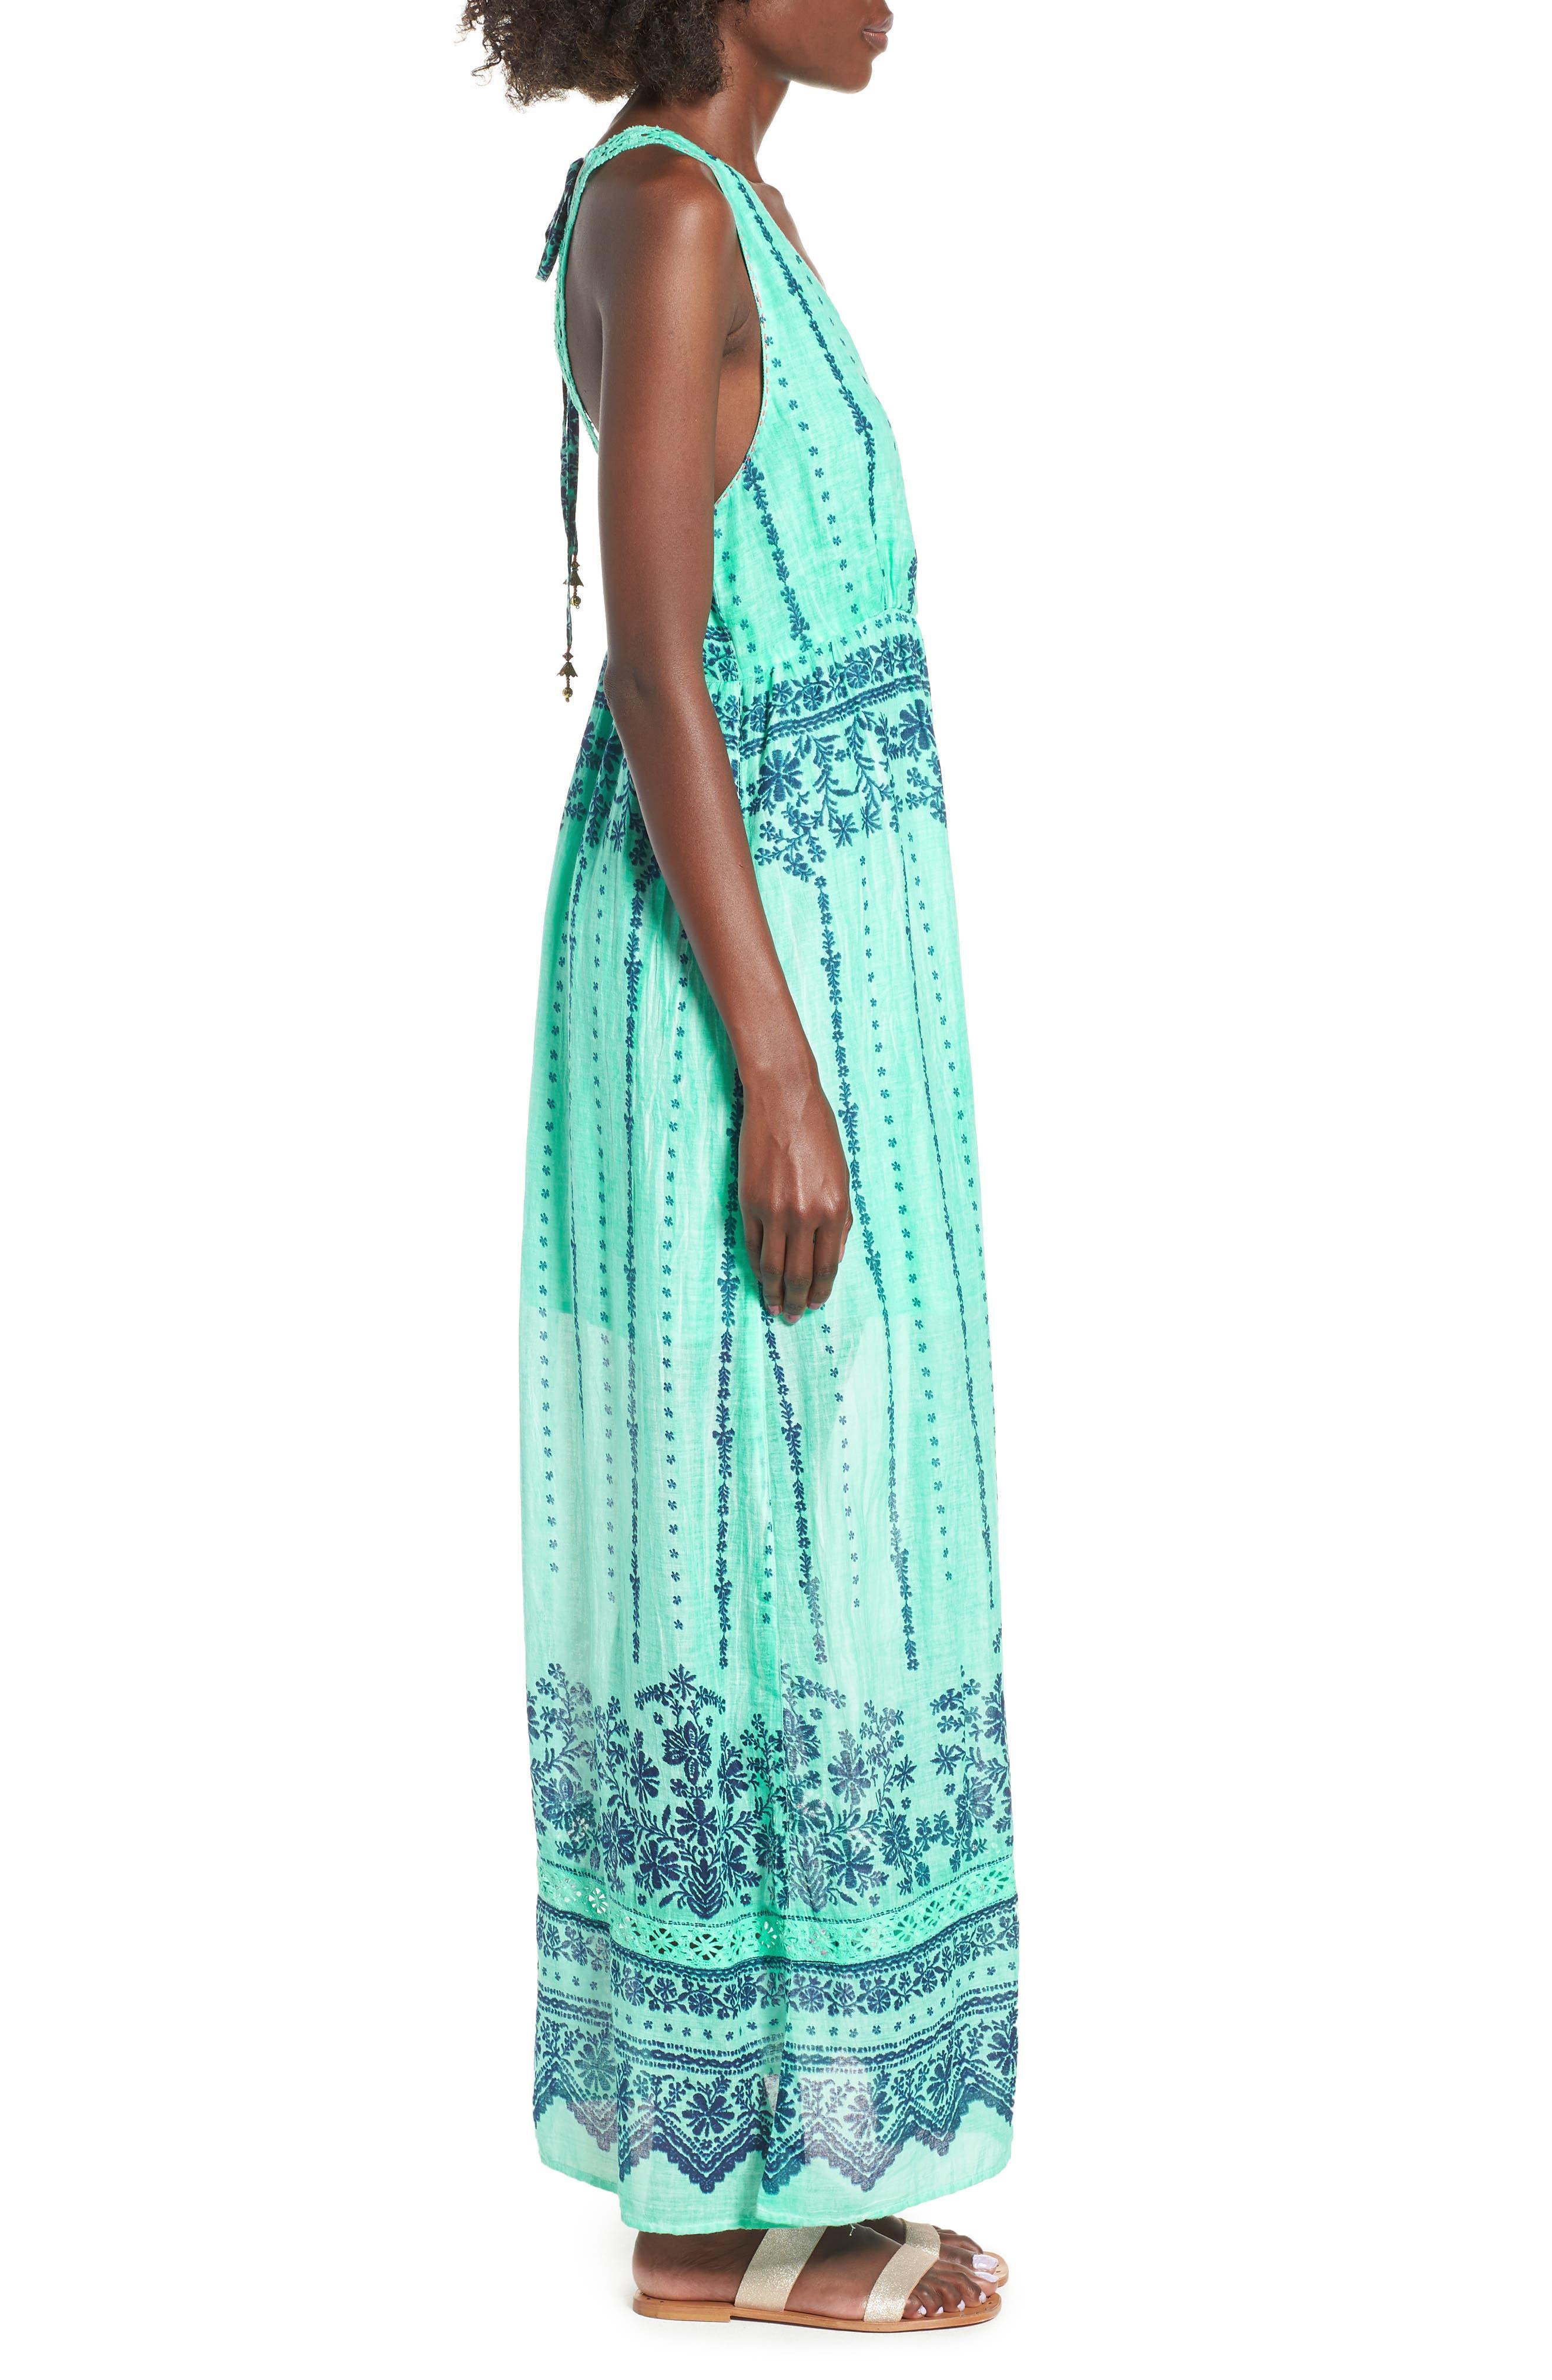 La Playita Maxi Dress,                             Alternate thumbnail 3, color,                             300